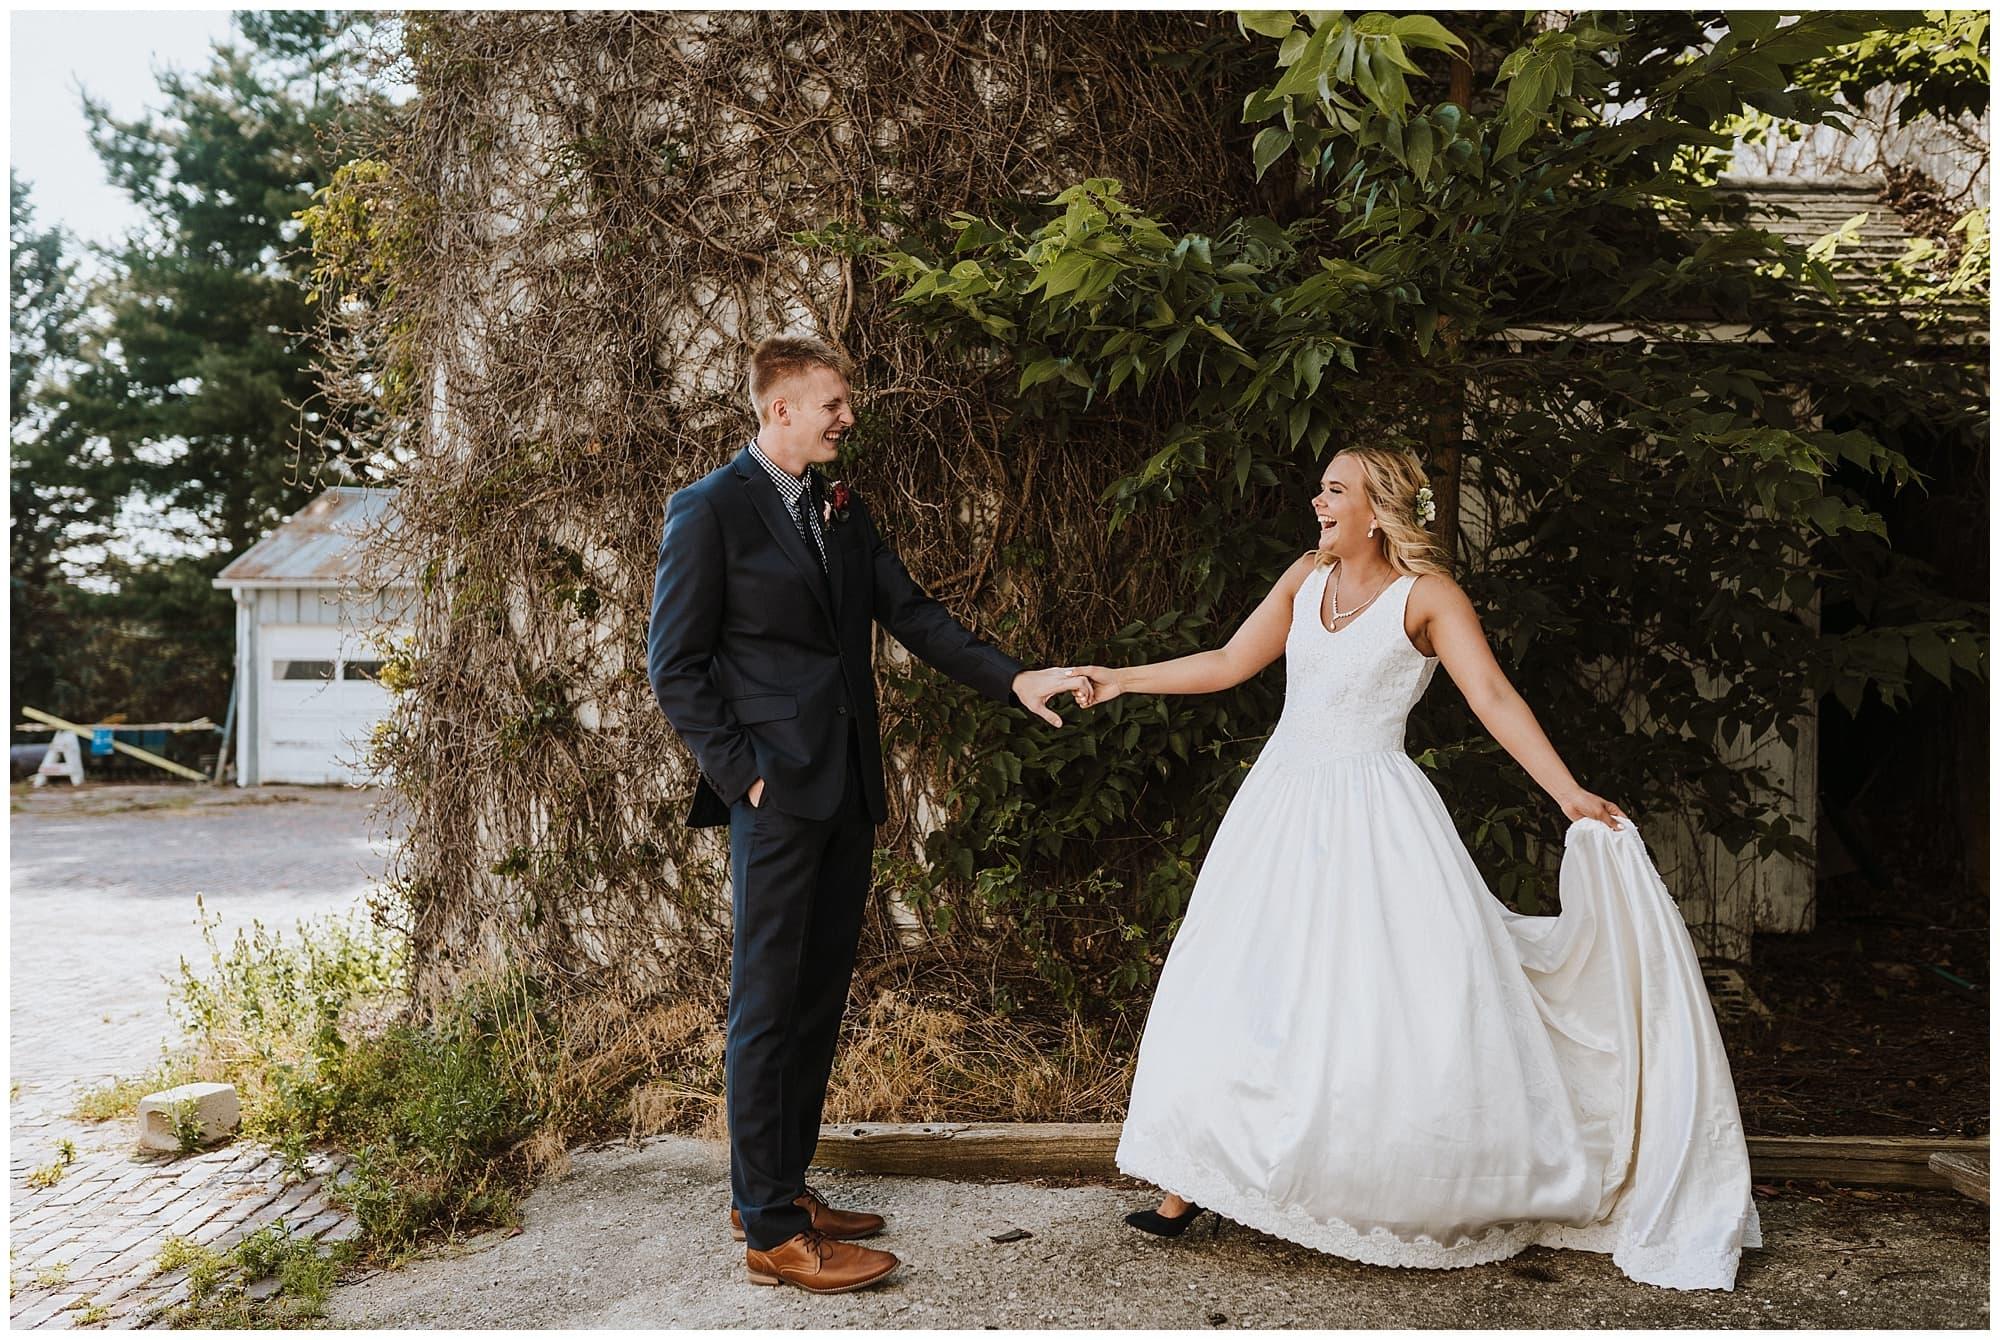 Adrian-Michigan-Wedding-Photographer-95.JPG